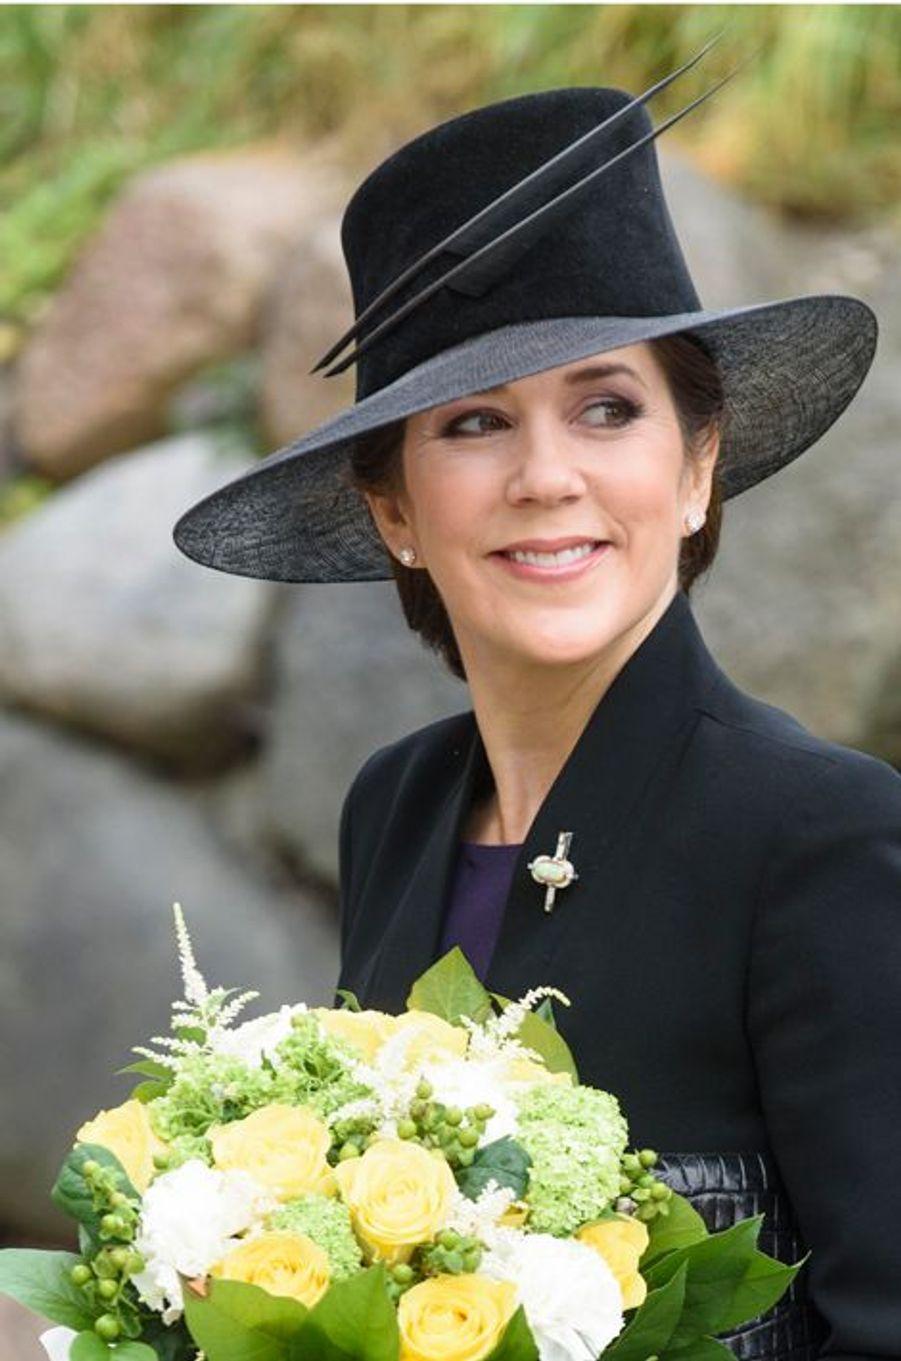 La princesse Mary de Danemark, le 25 avril 2015